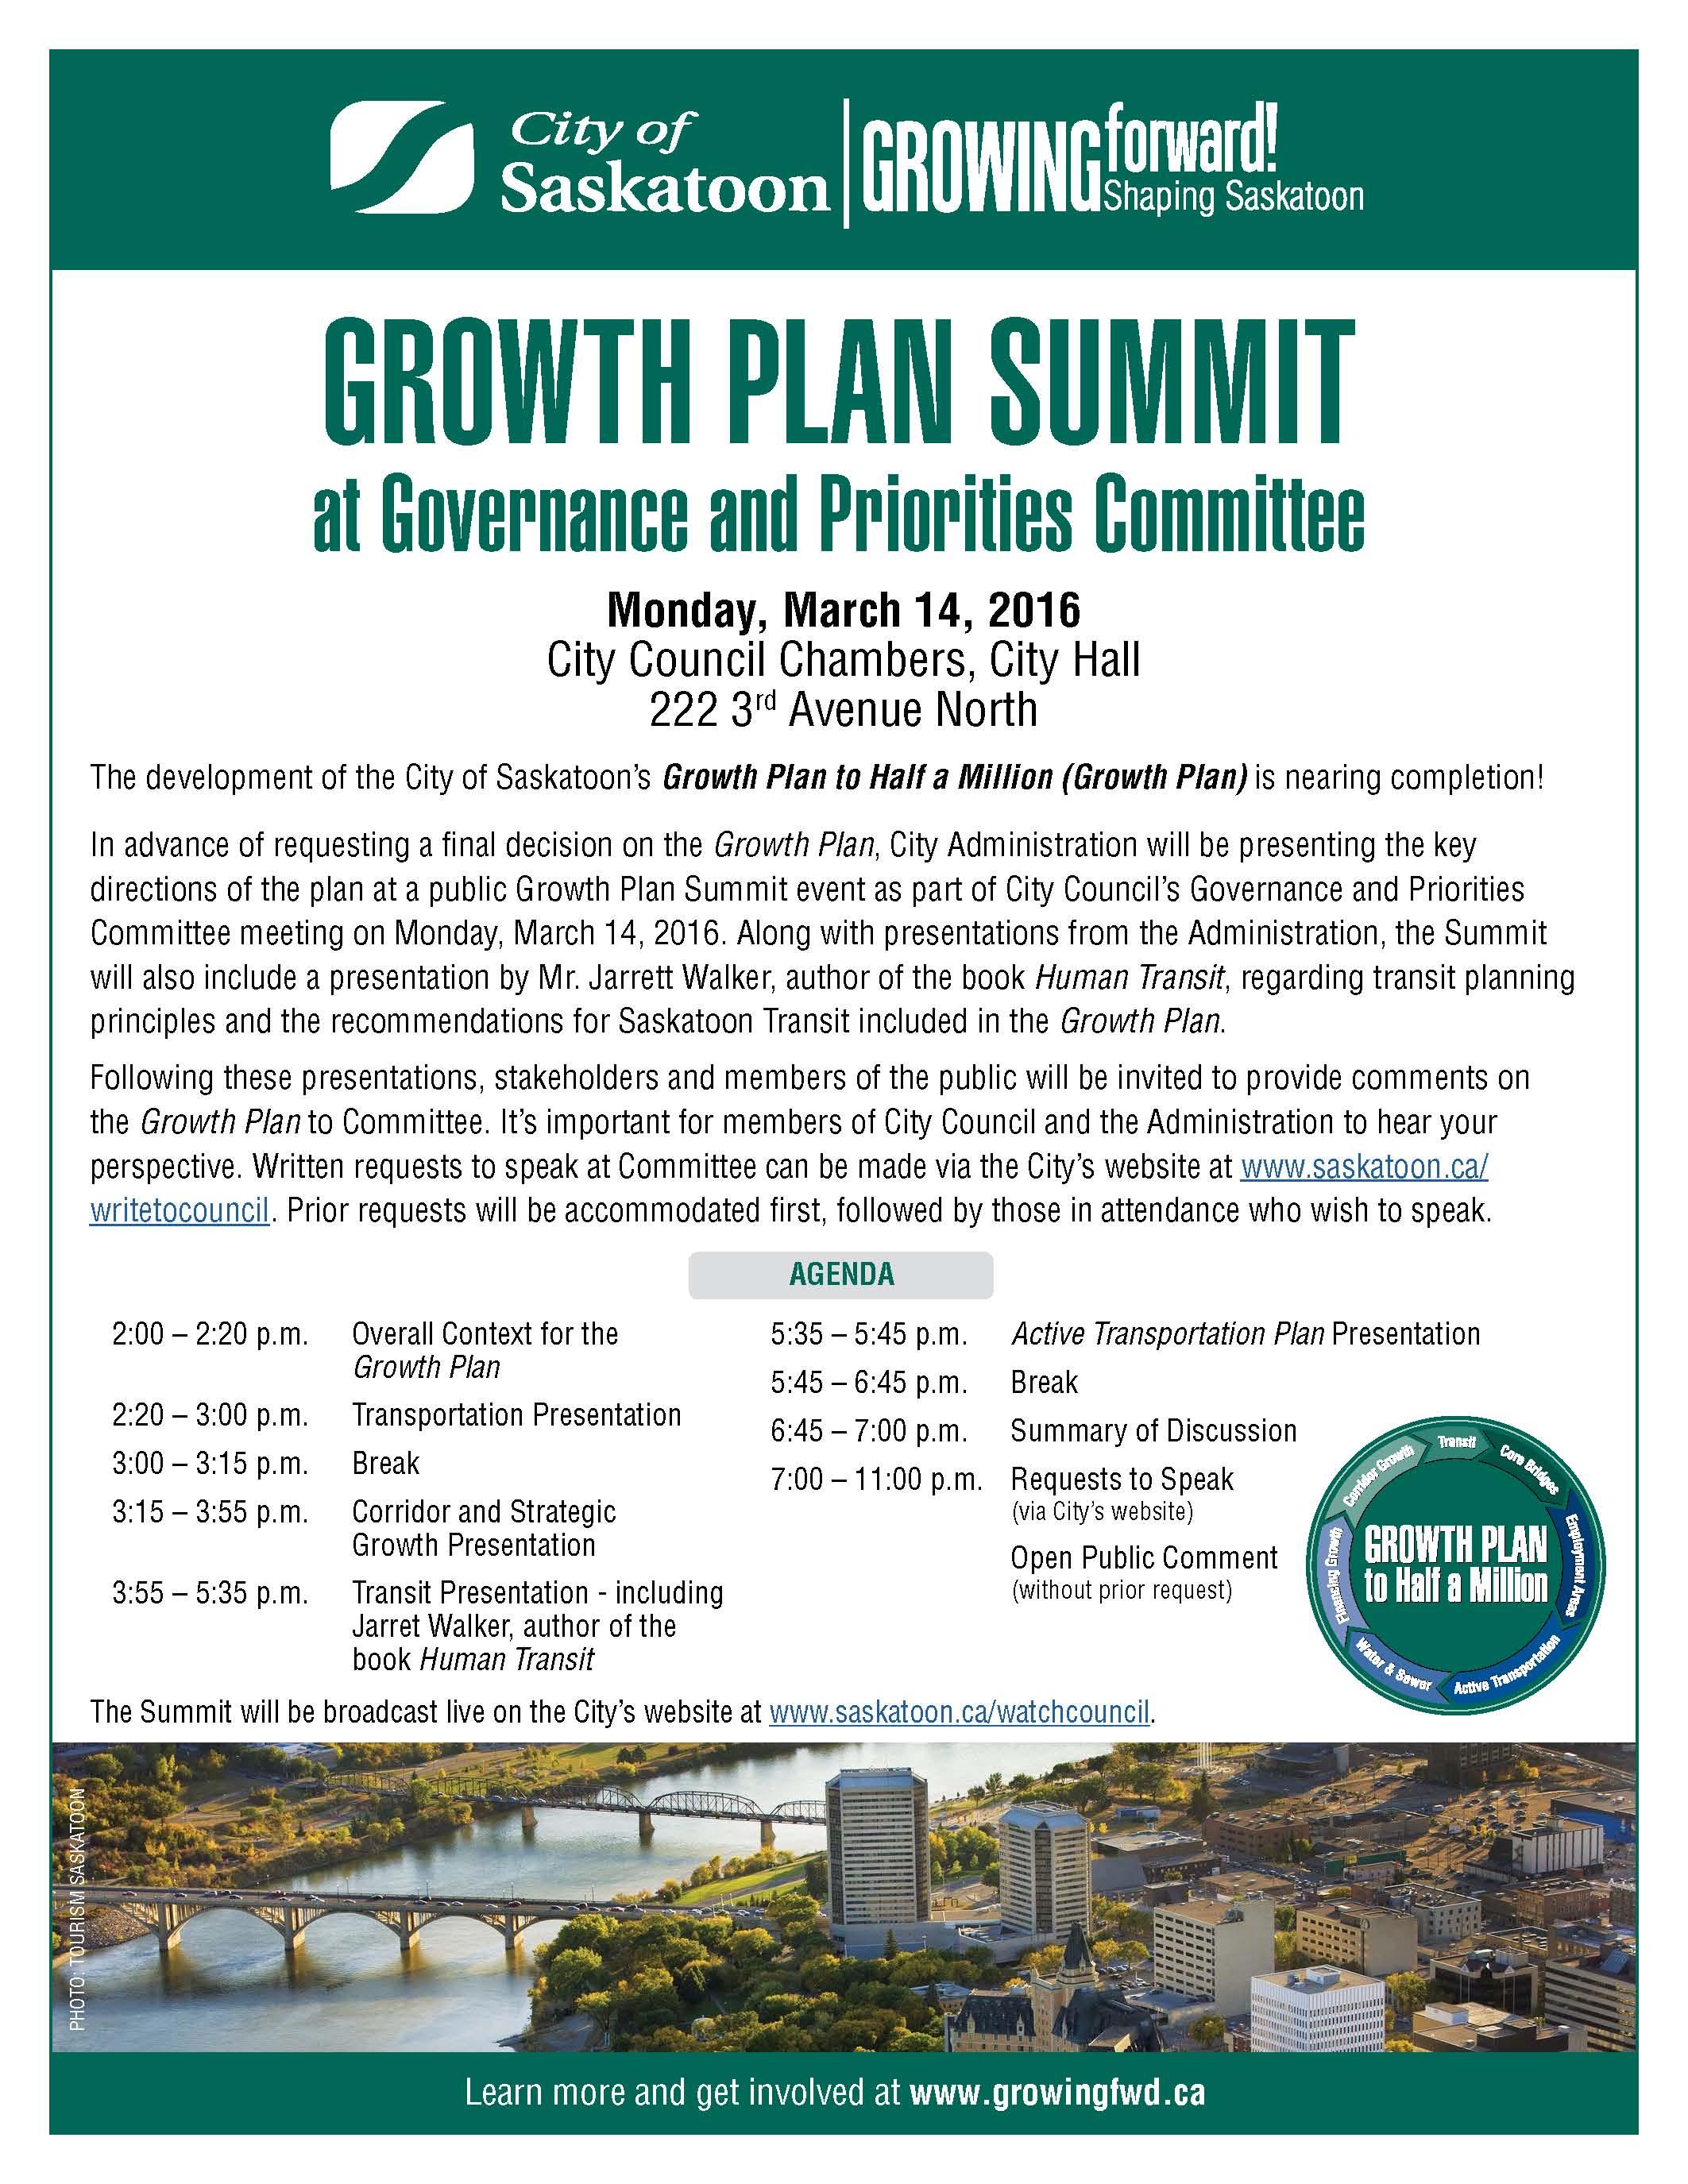 Upcoming Growth Plan Summit!